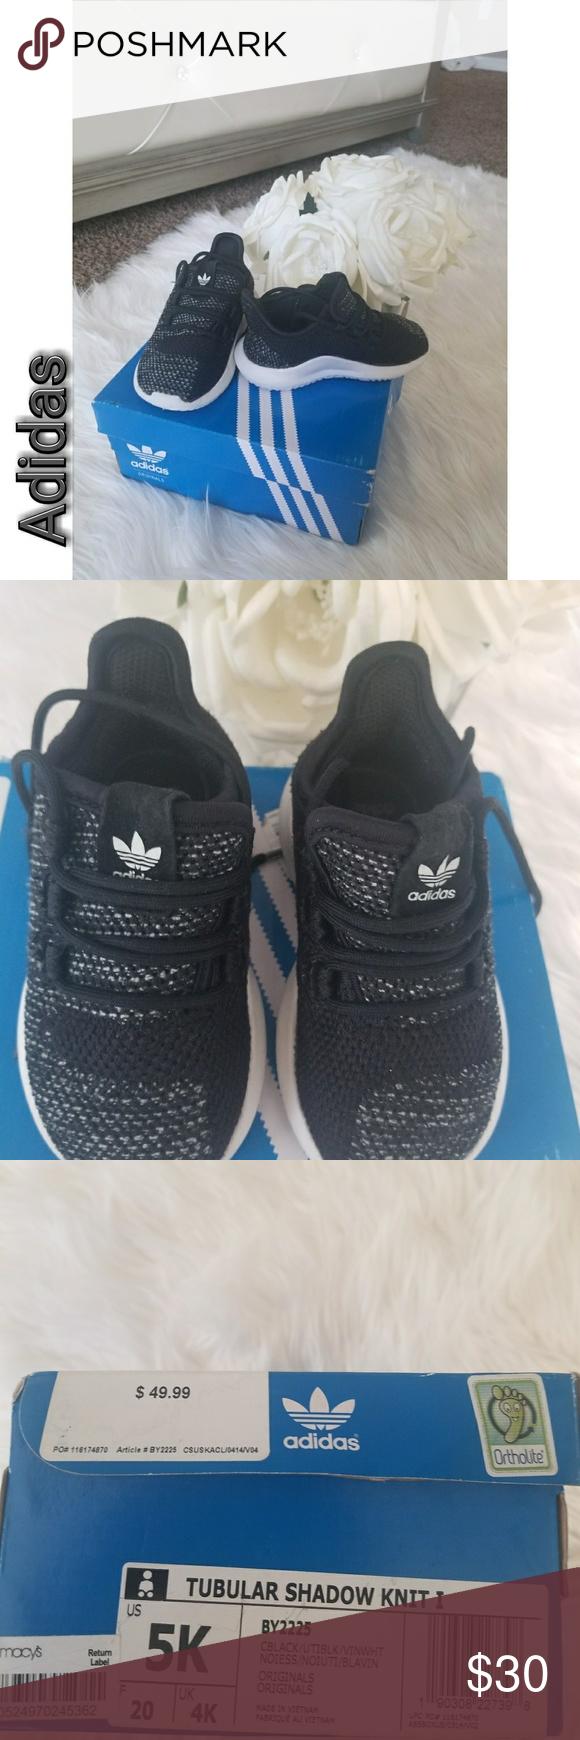 Adidas tubulare bambino scarpe adidas, le adidas e scarpe da ginnastica